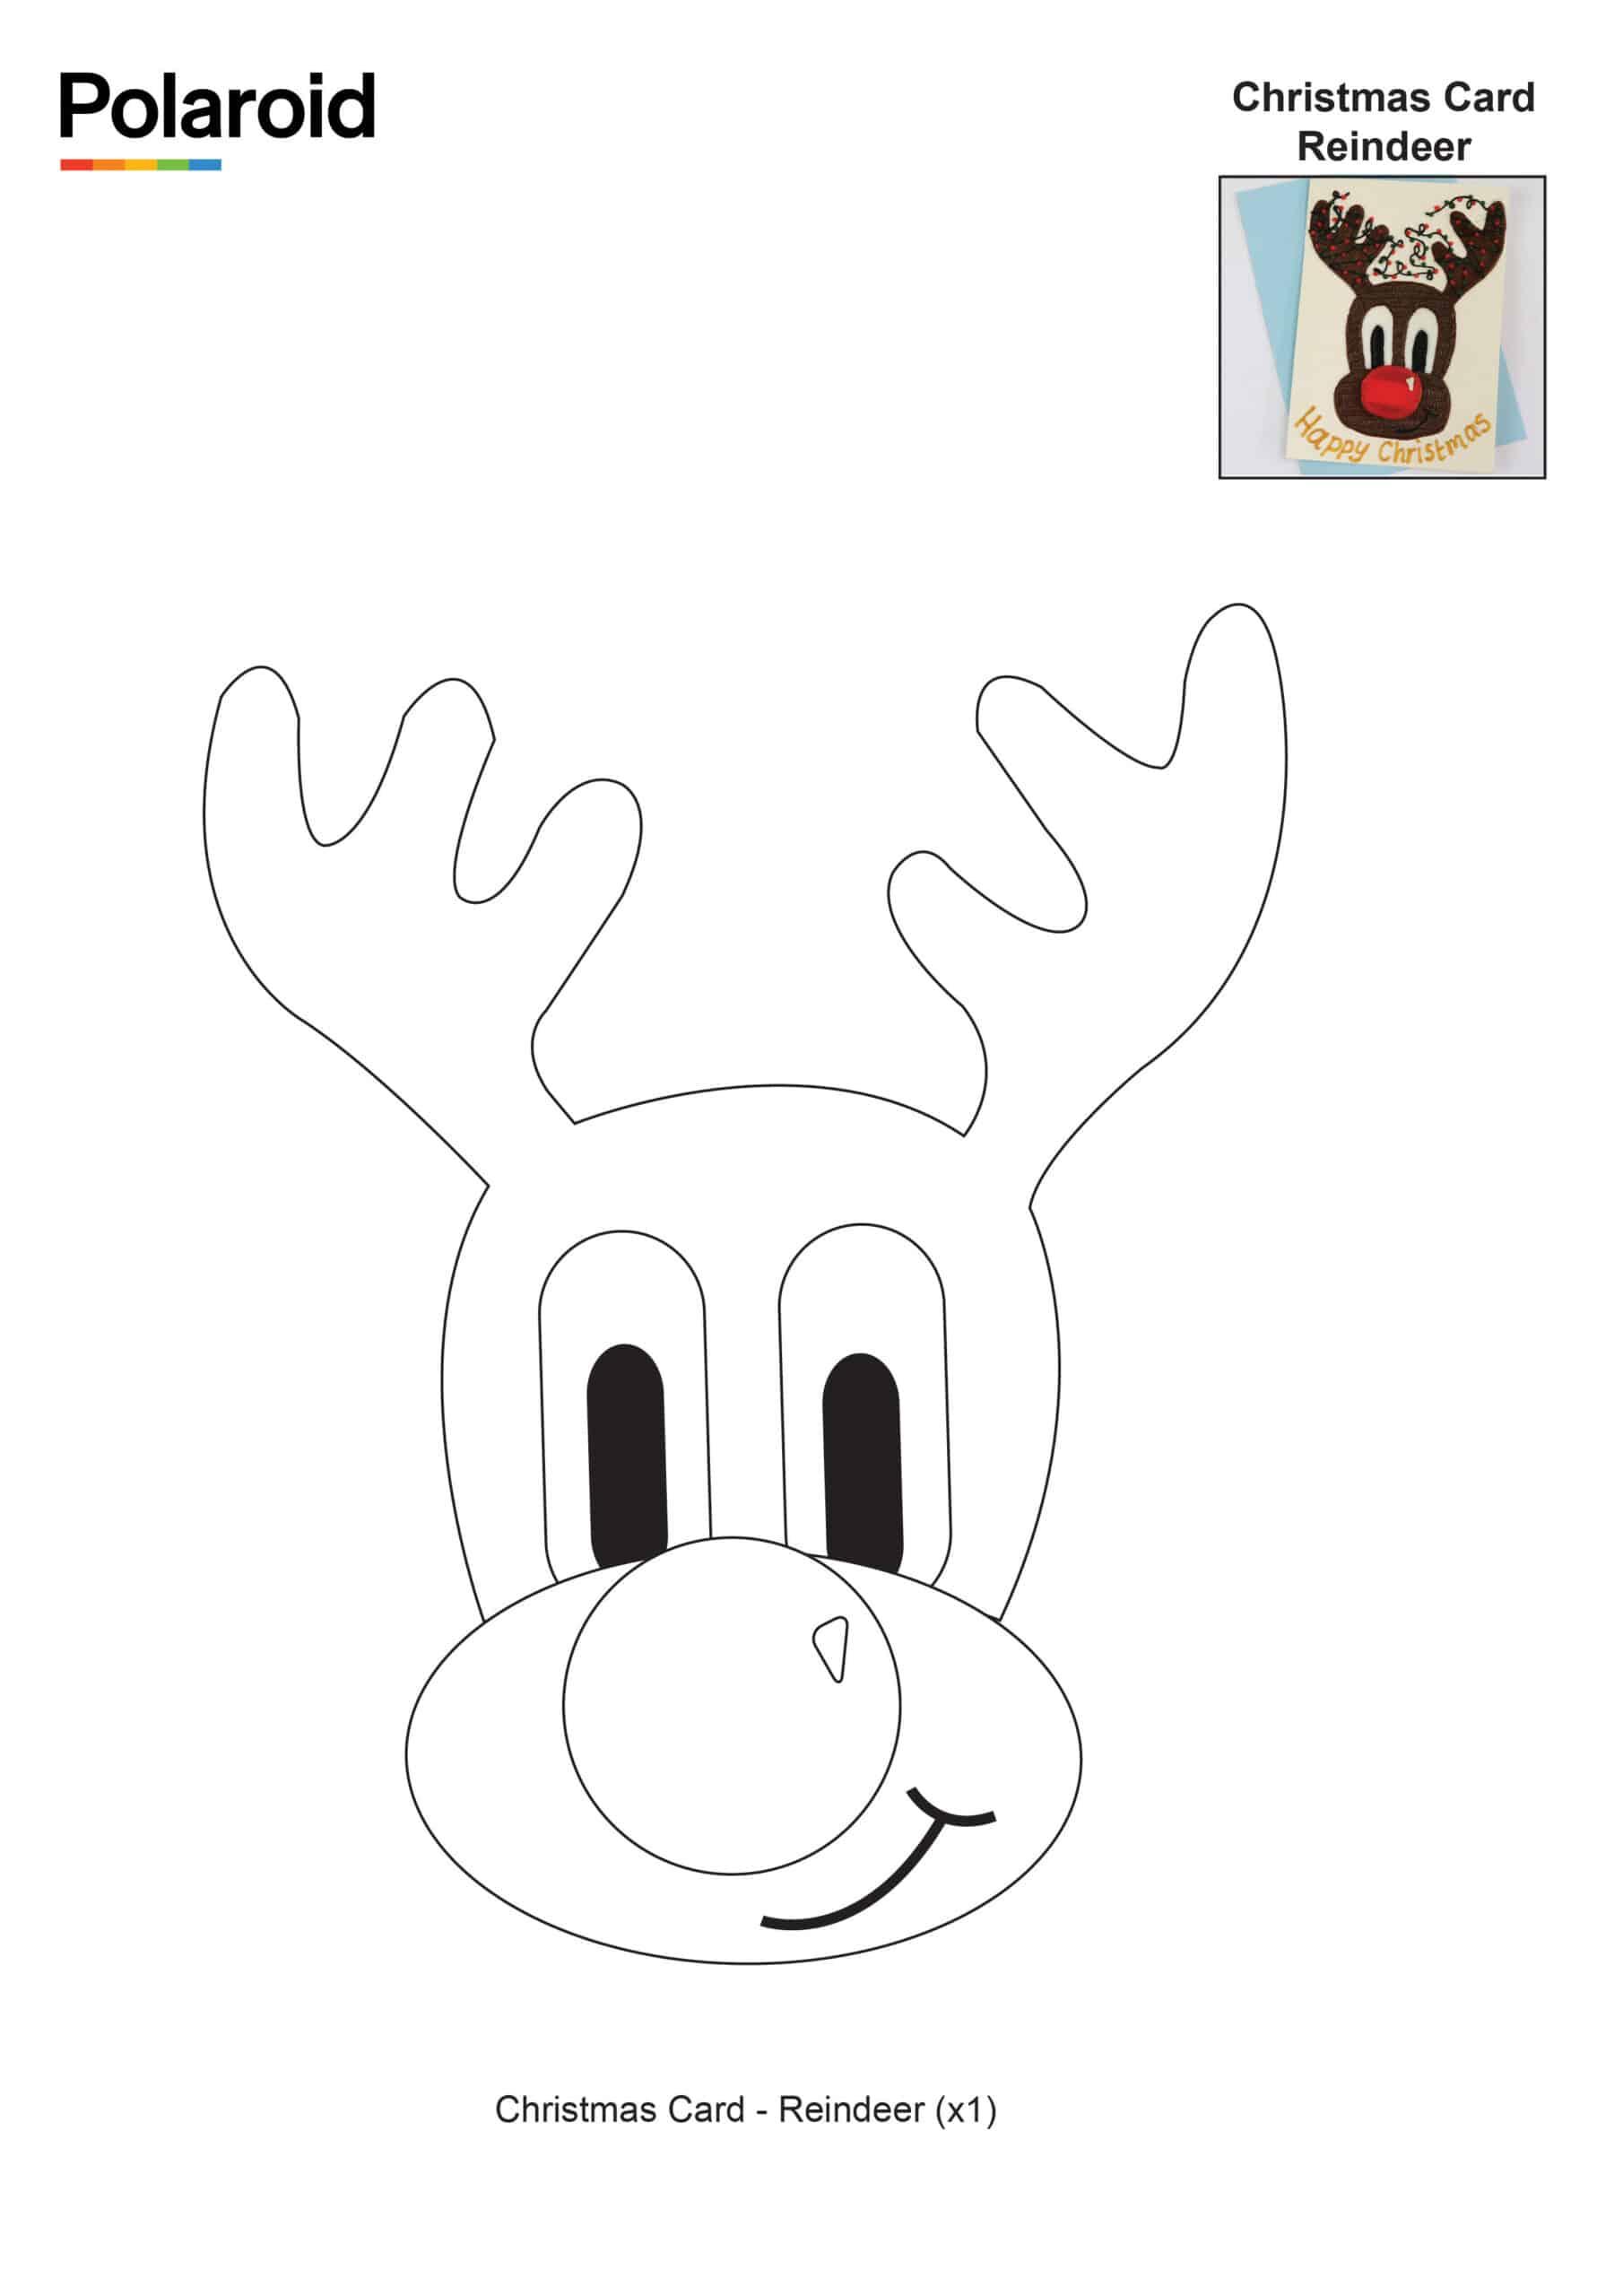 Christmas Card Reindeer_New Logo